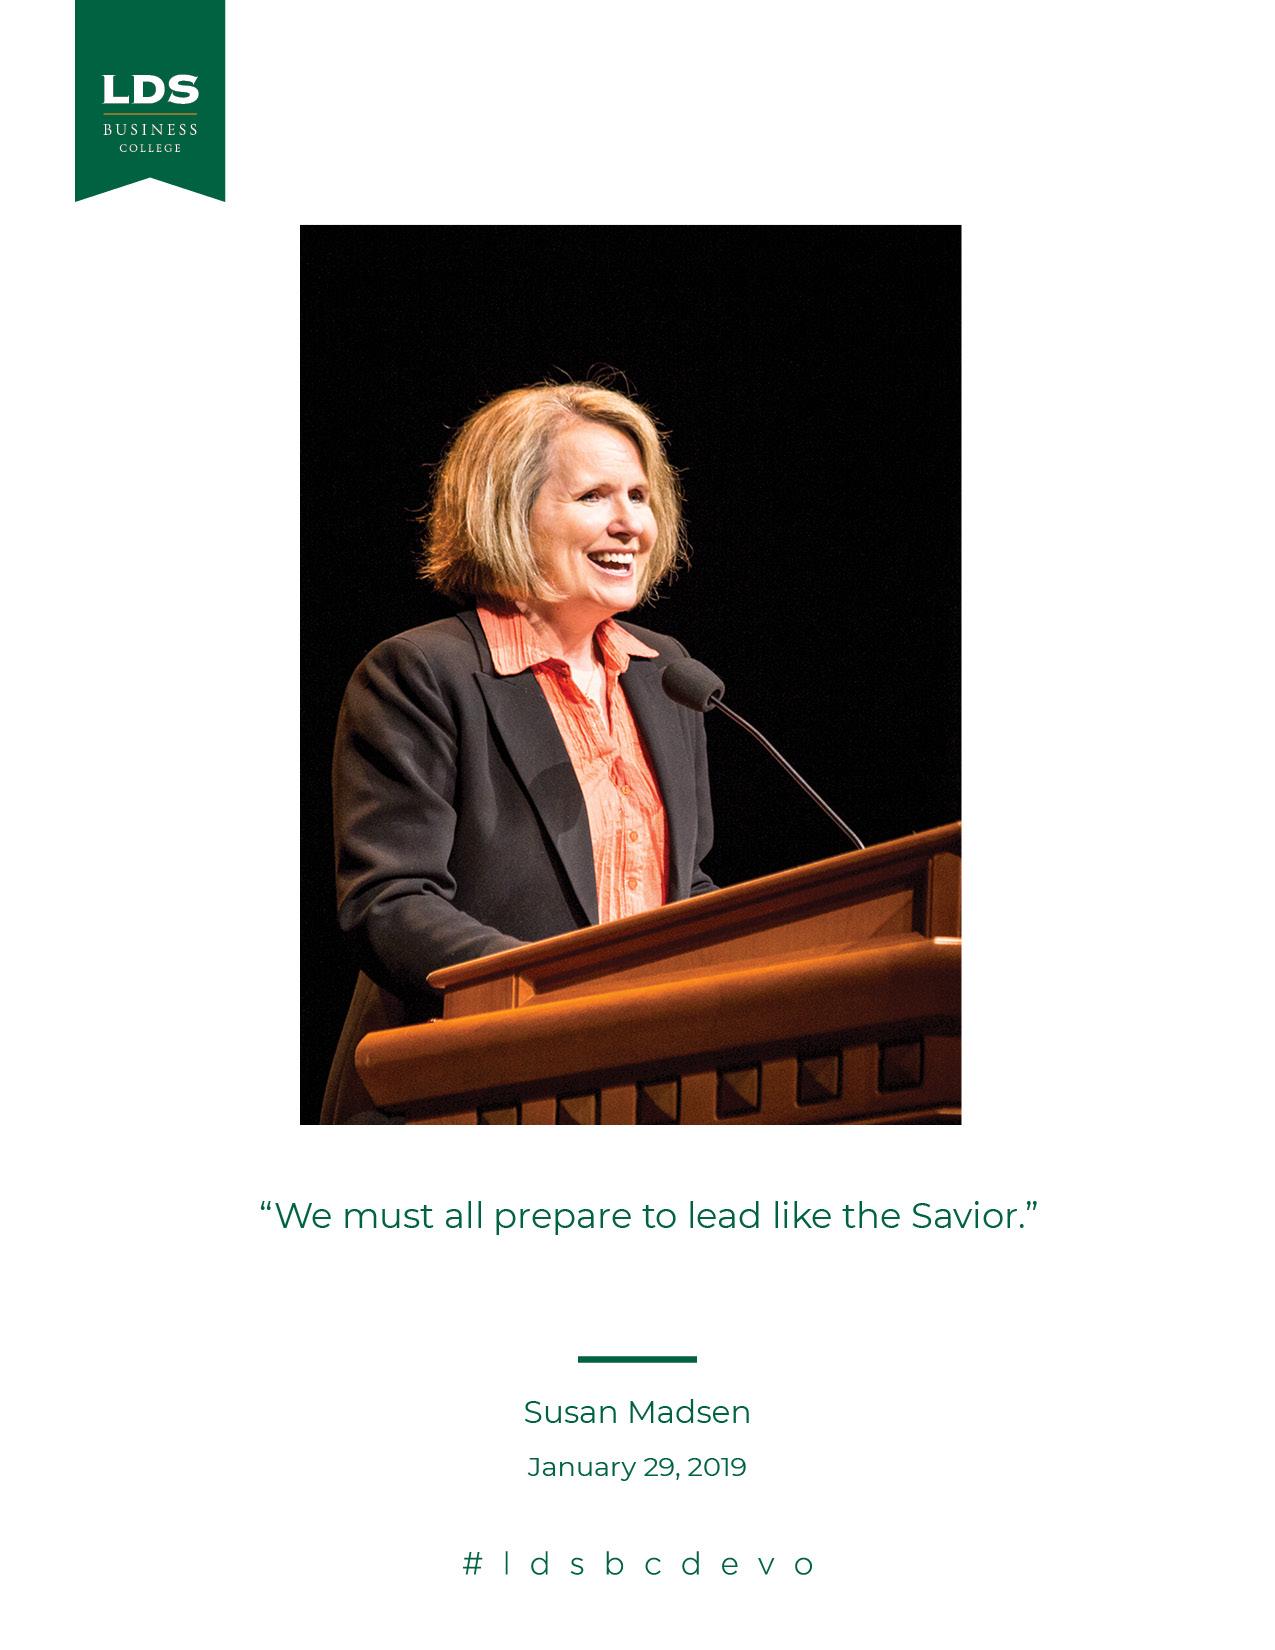 Susan Madsen quote